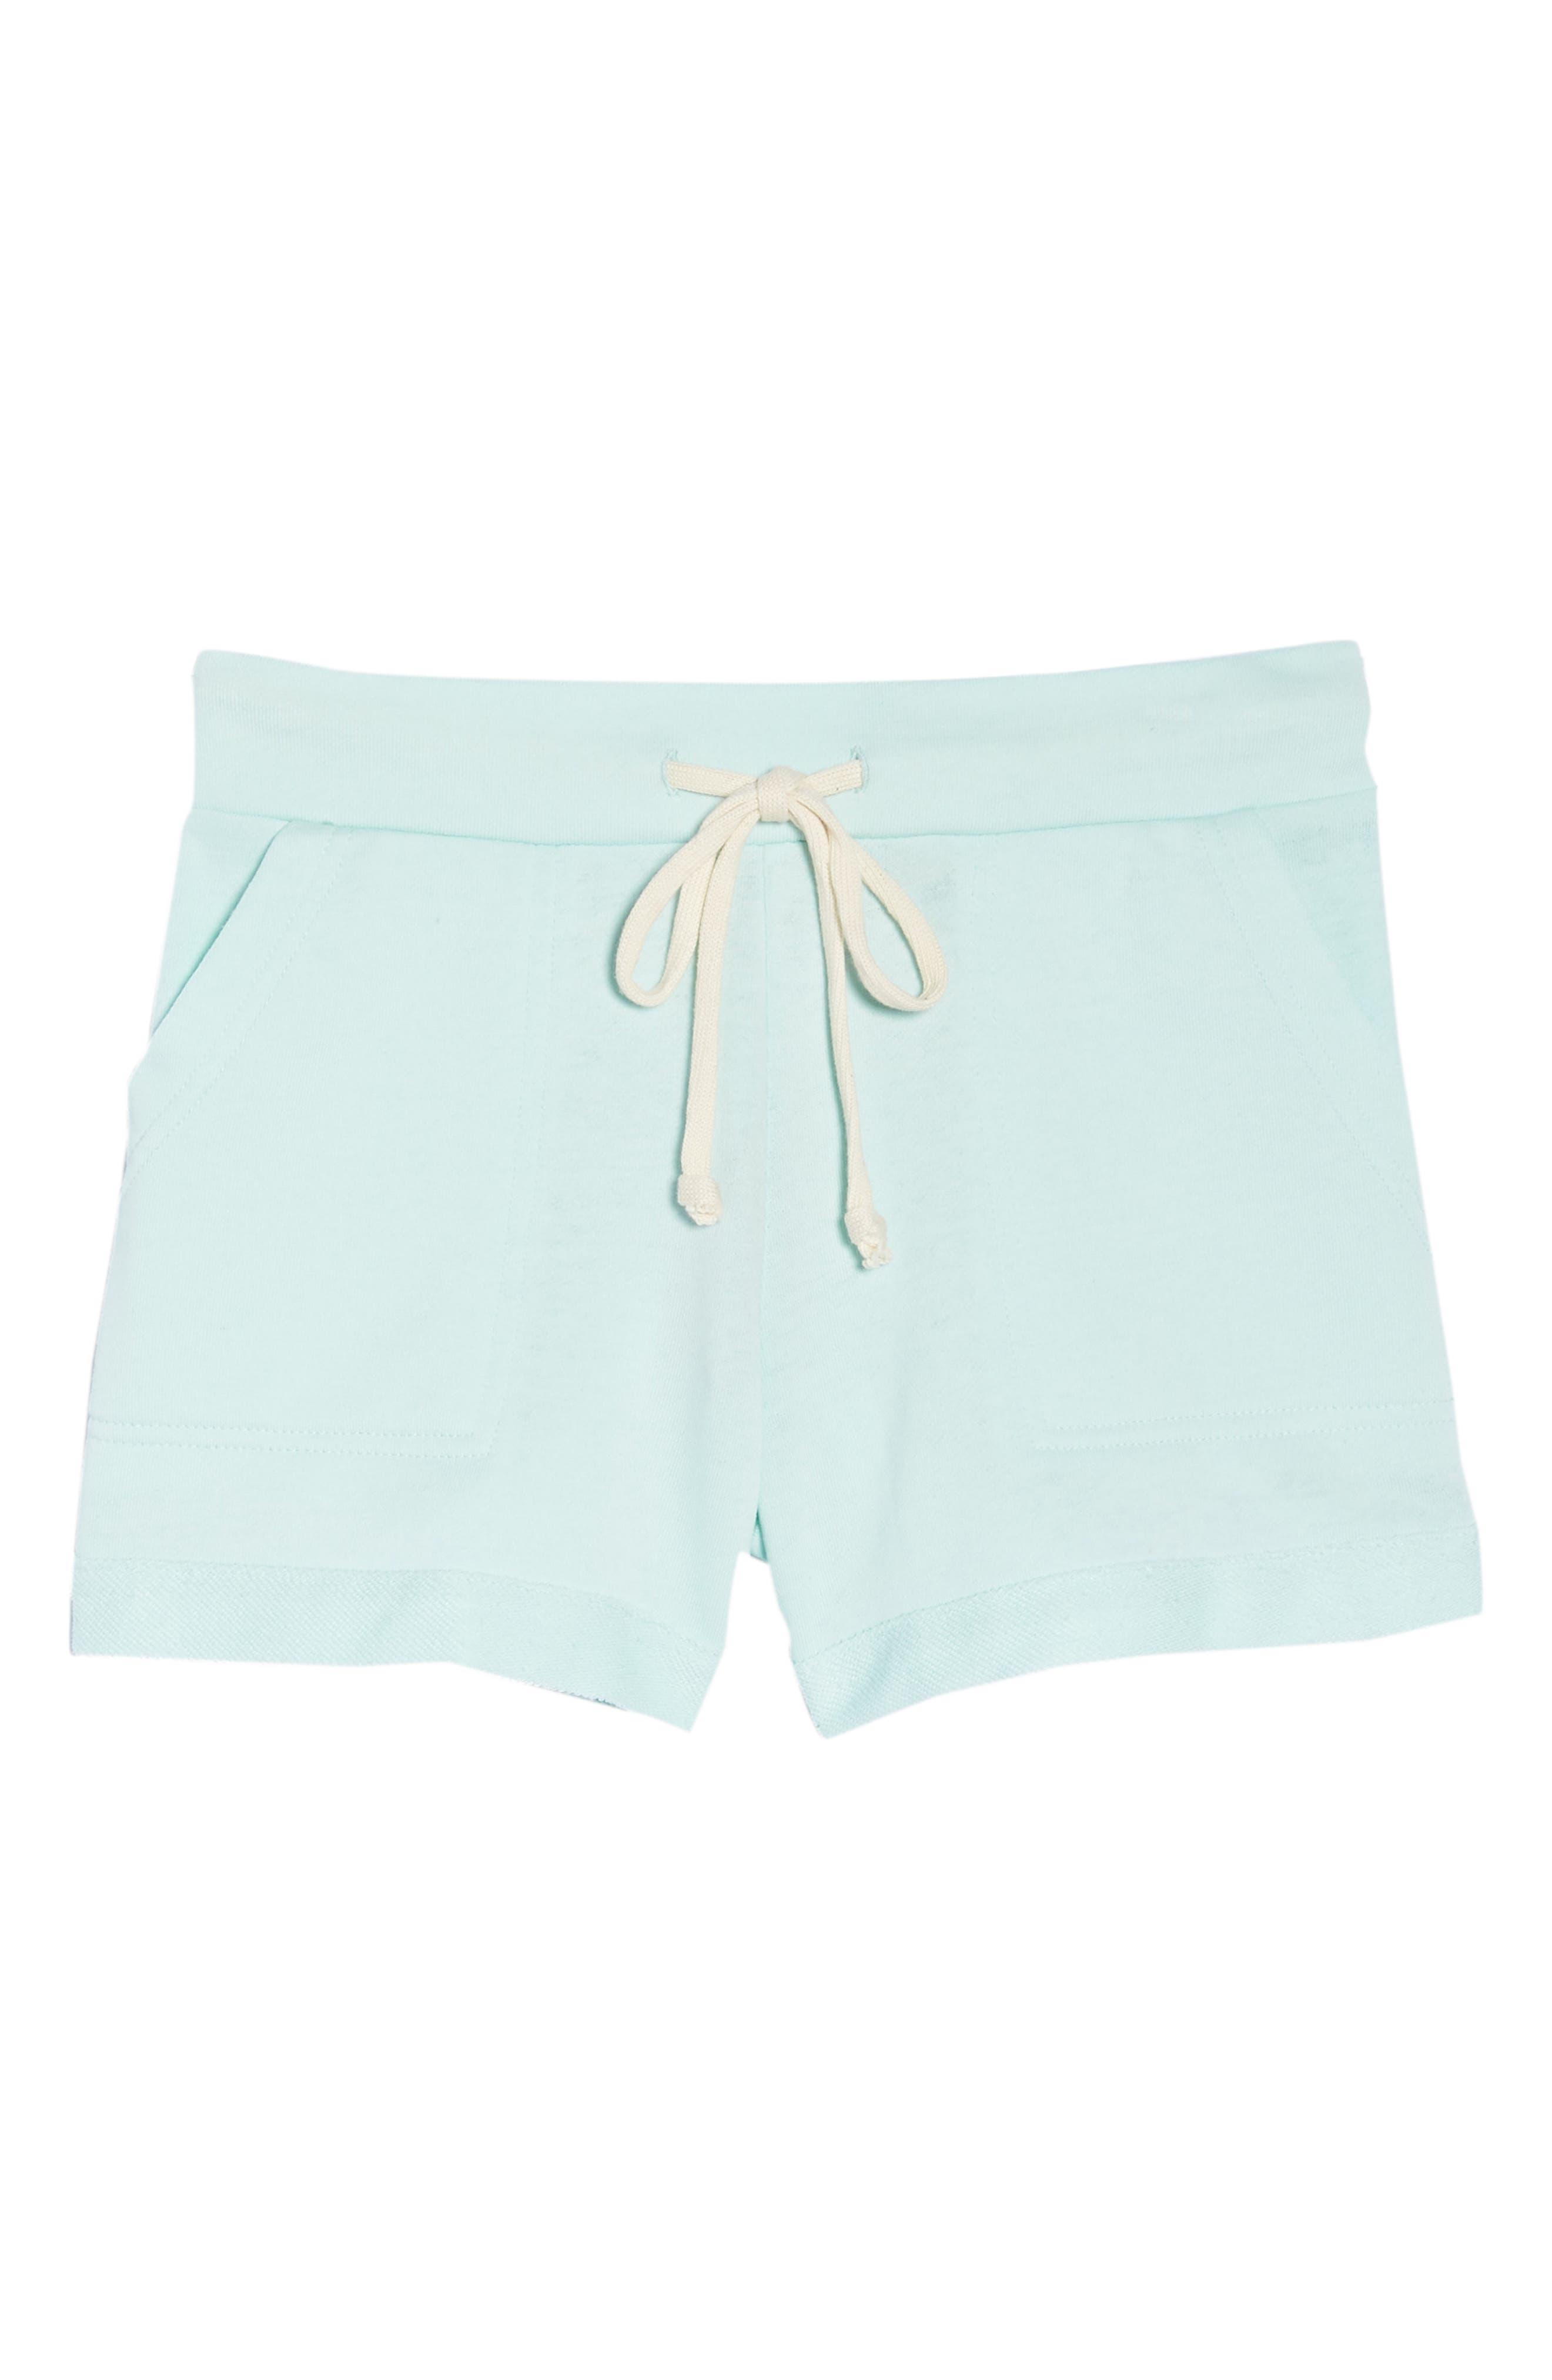 Lounge Shorts,                             Alternate thumbnail 6, color,                             300